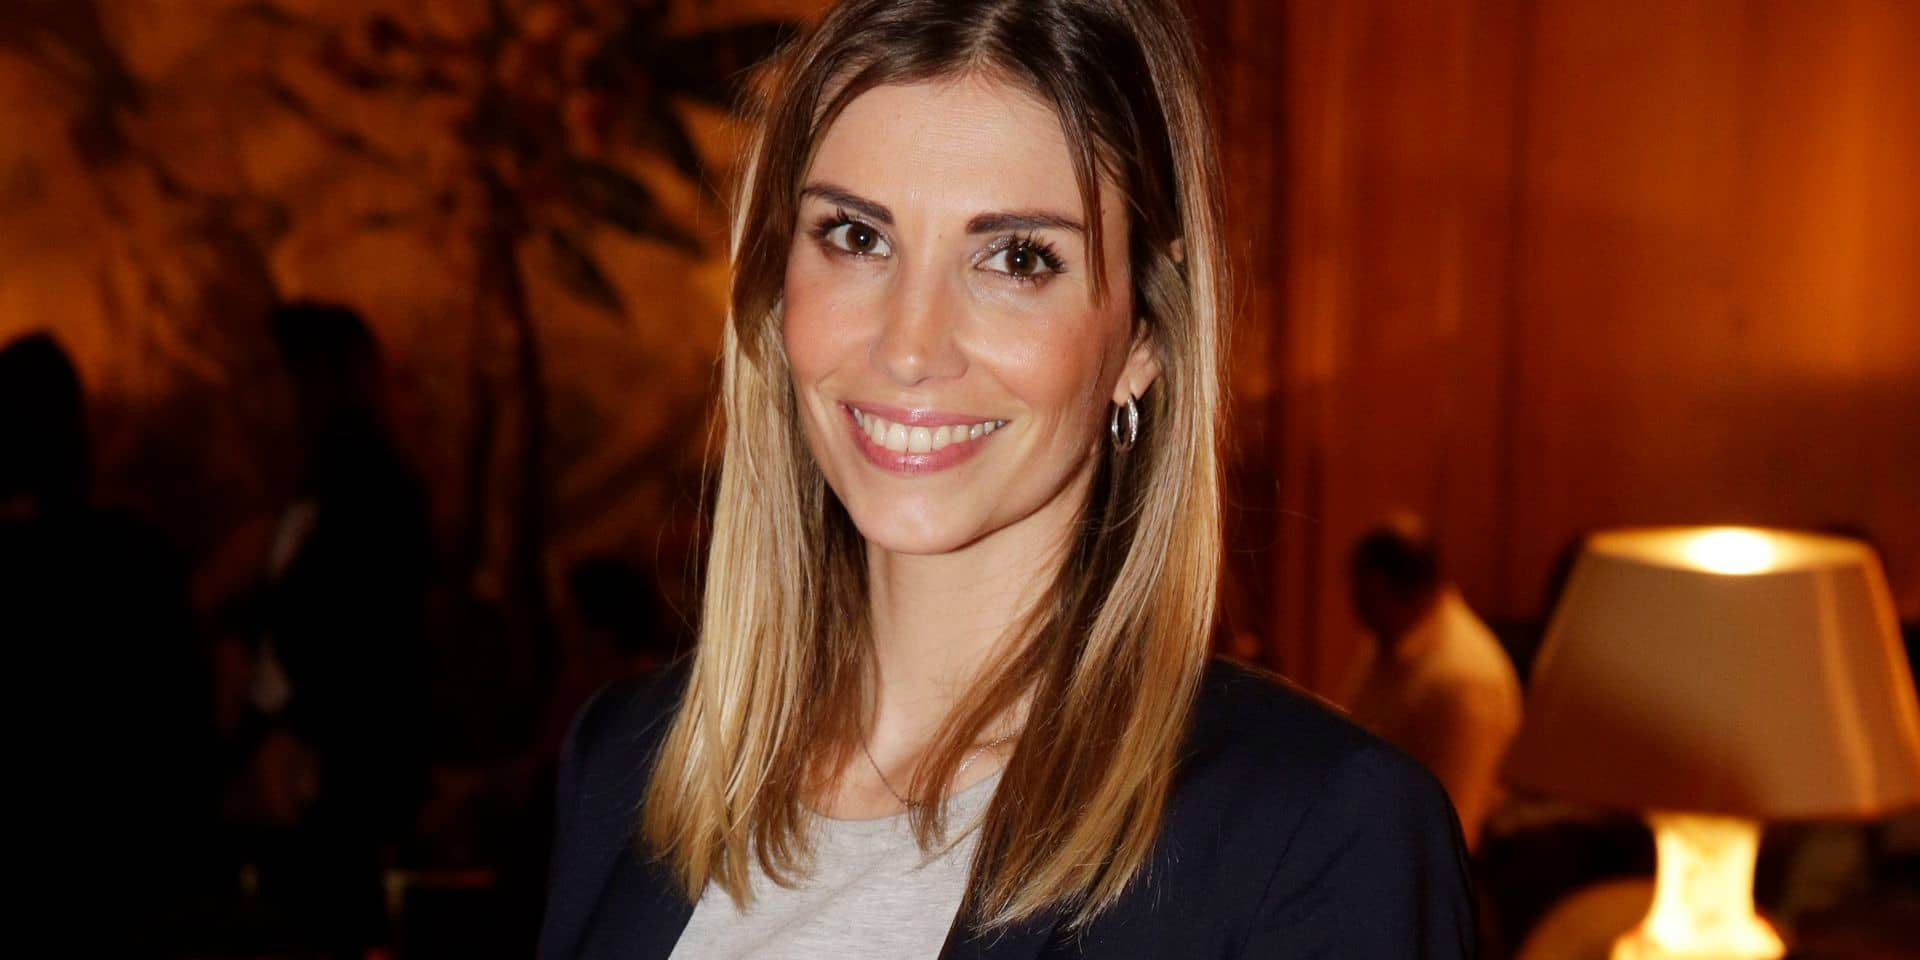 L'ex-Miss France Alexandra Rosenfeld en couple avec un célèbre journaliste